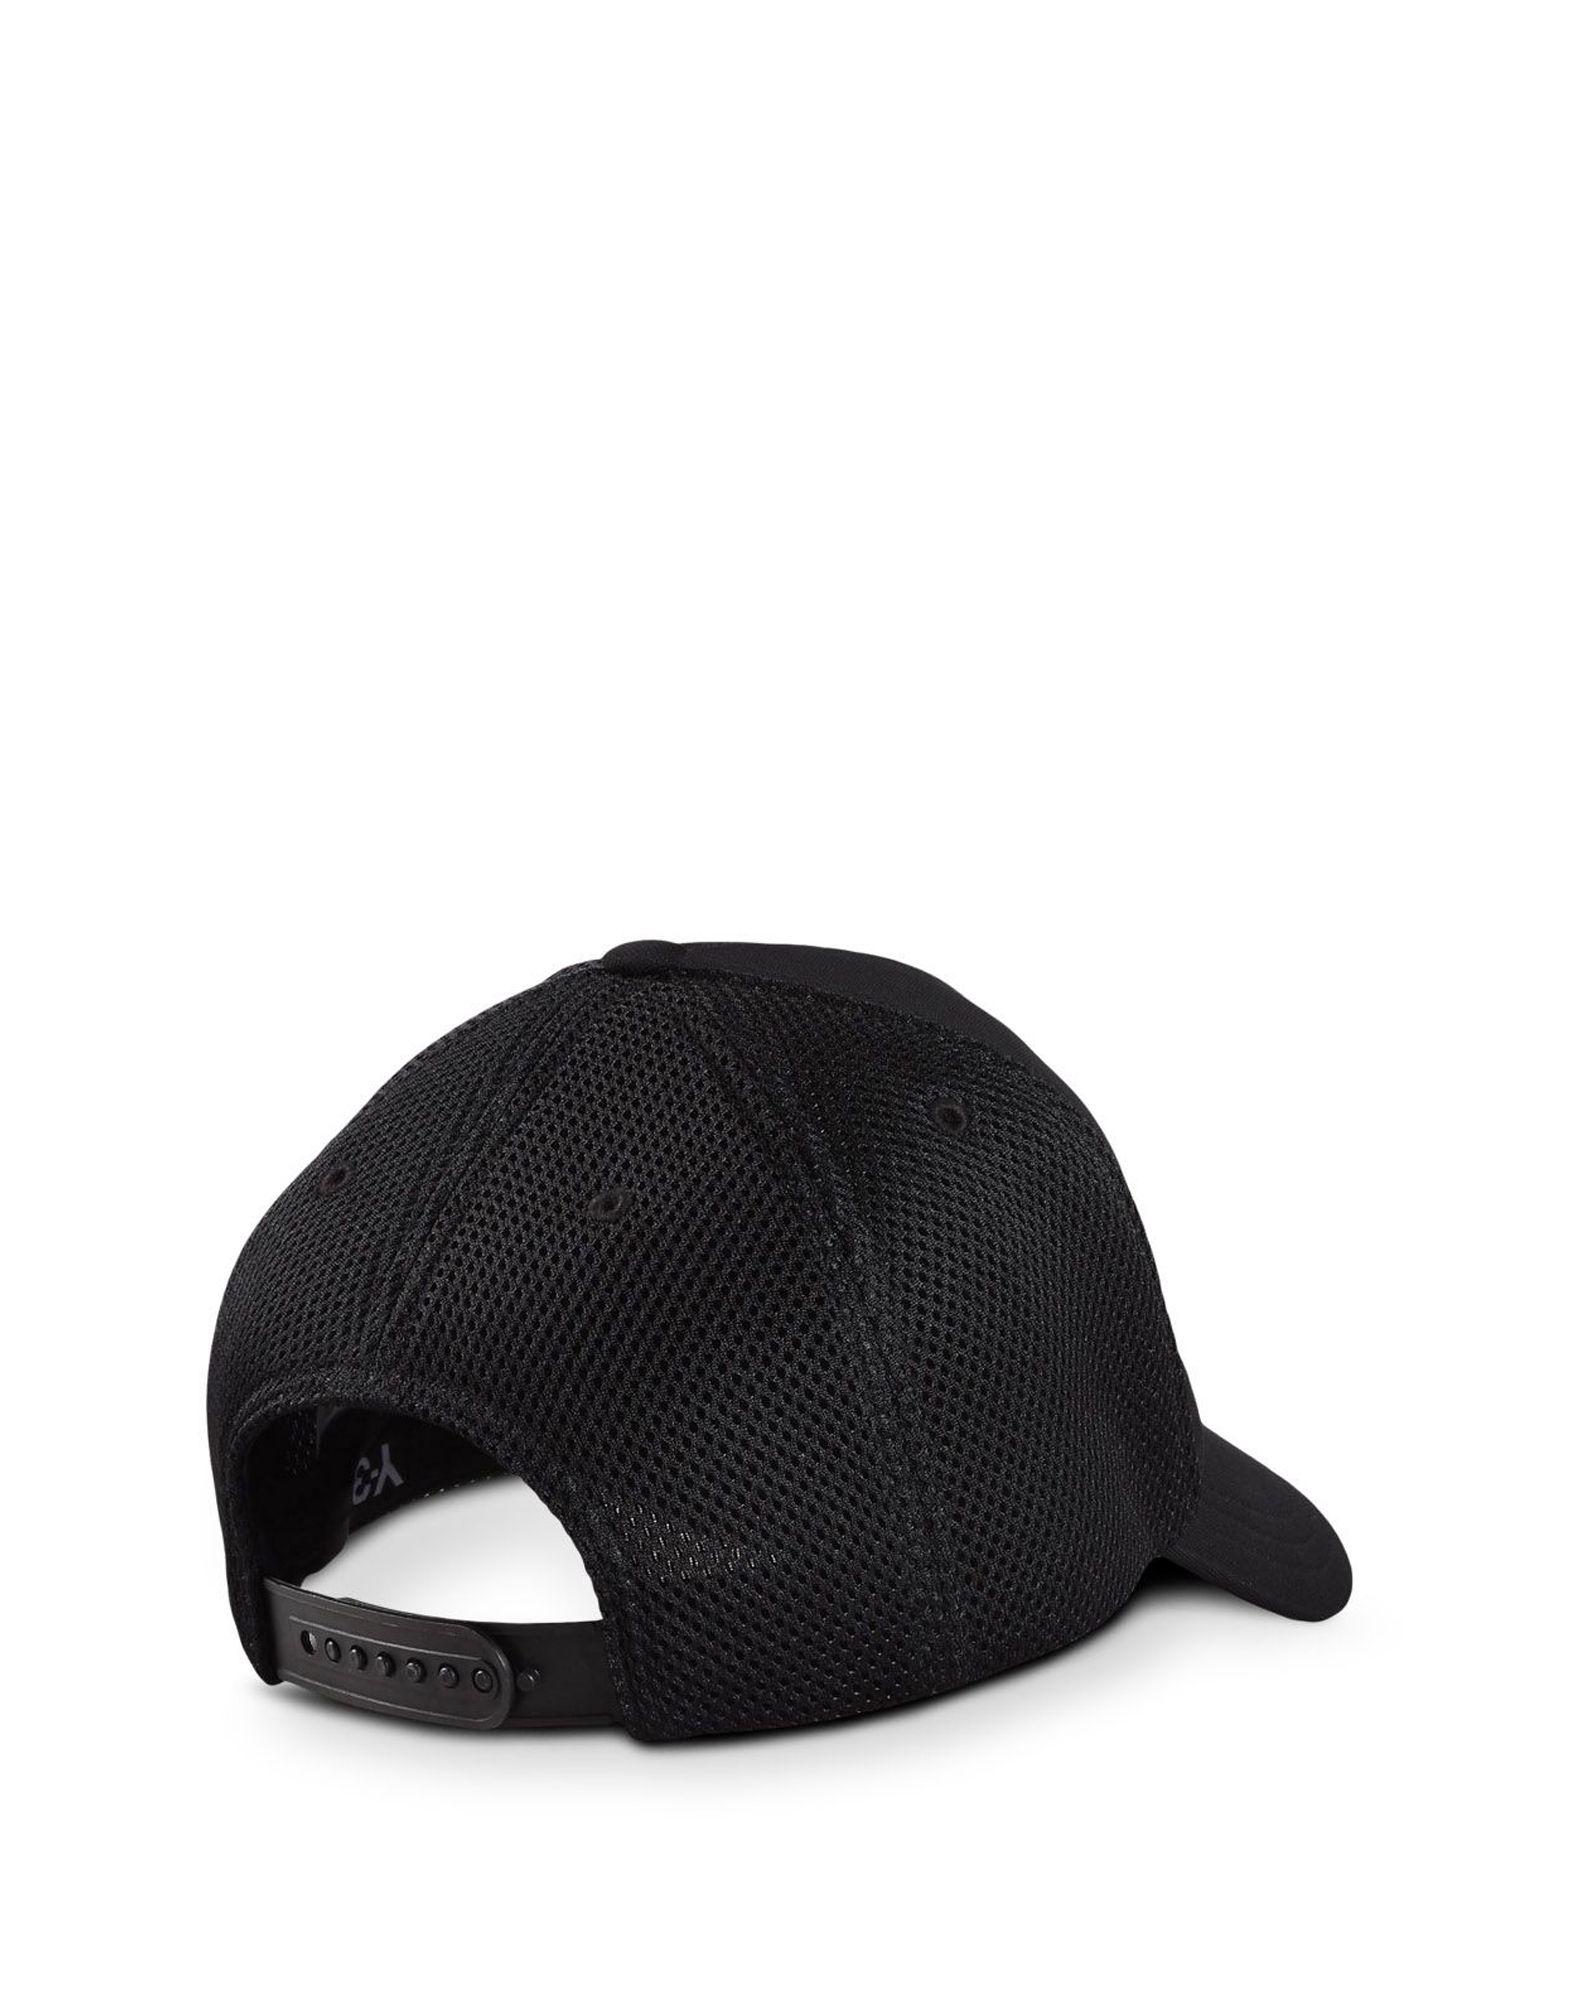 Y-3 TRUCK BLACK HAT OTHER ACCESSORIES unisex Y-3 adidas